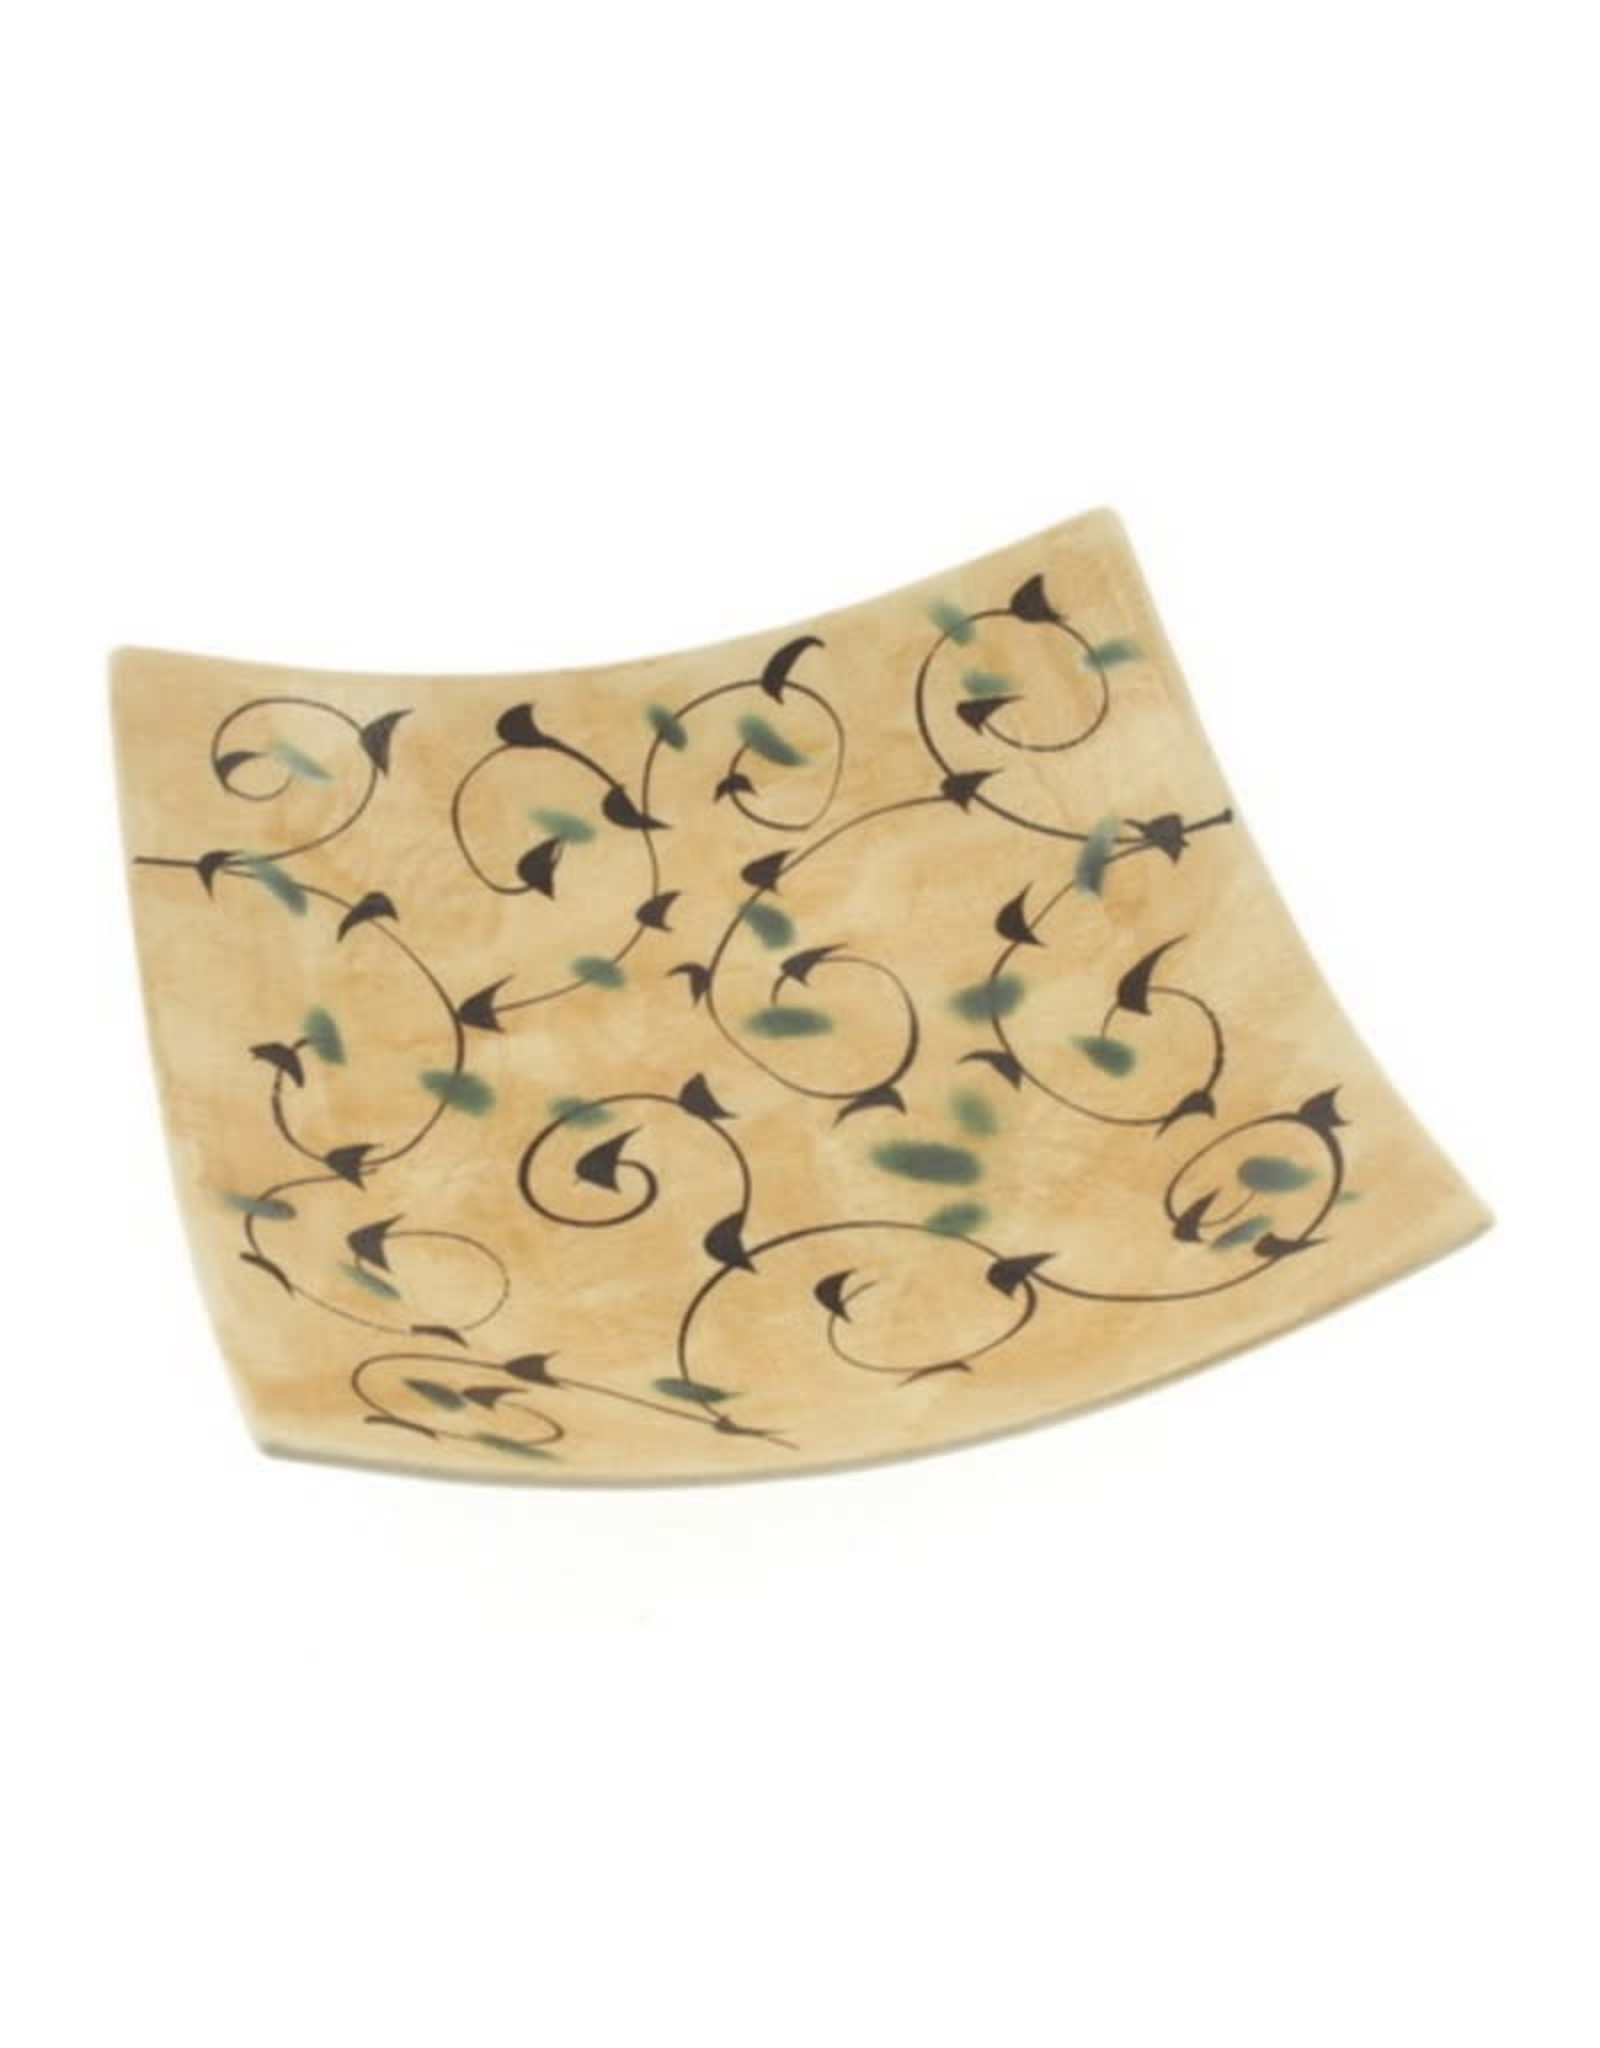 Kotobuki Trading Co. Inc Plate Square Gold/Taupe Arabesque